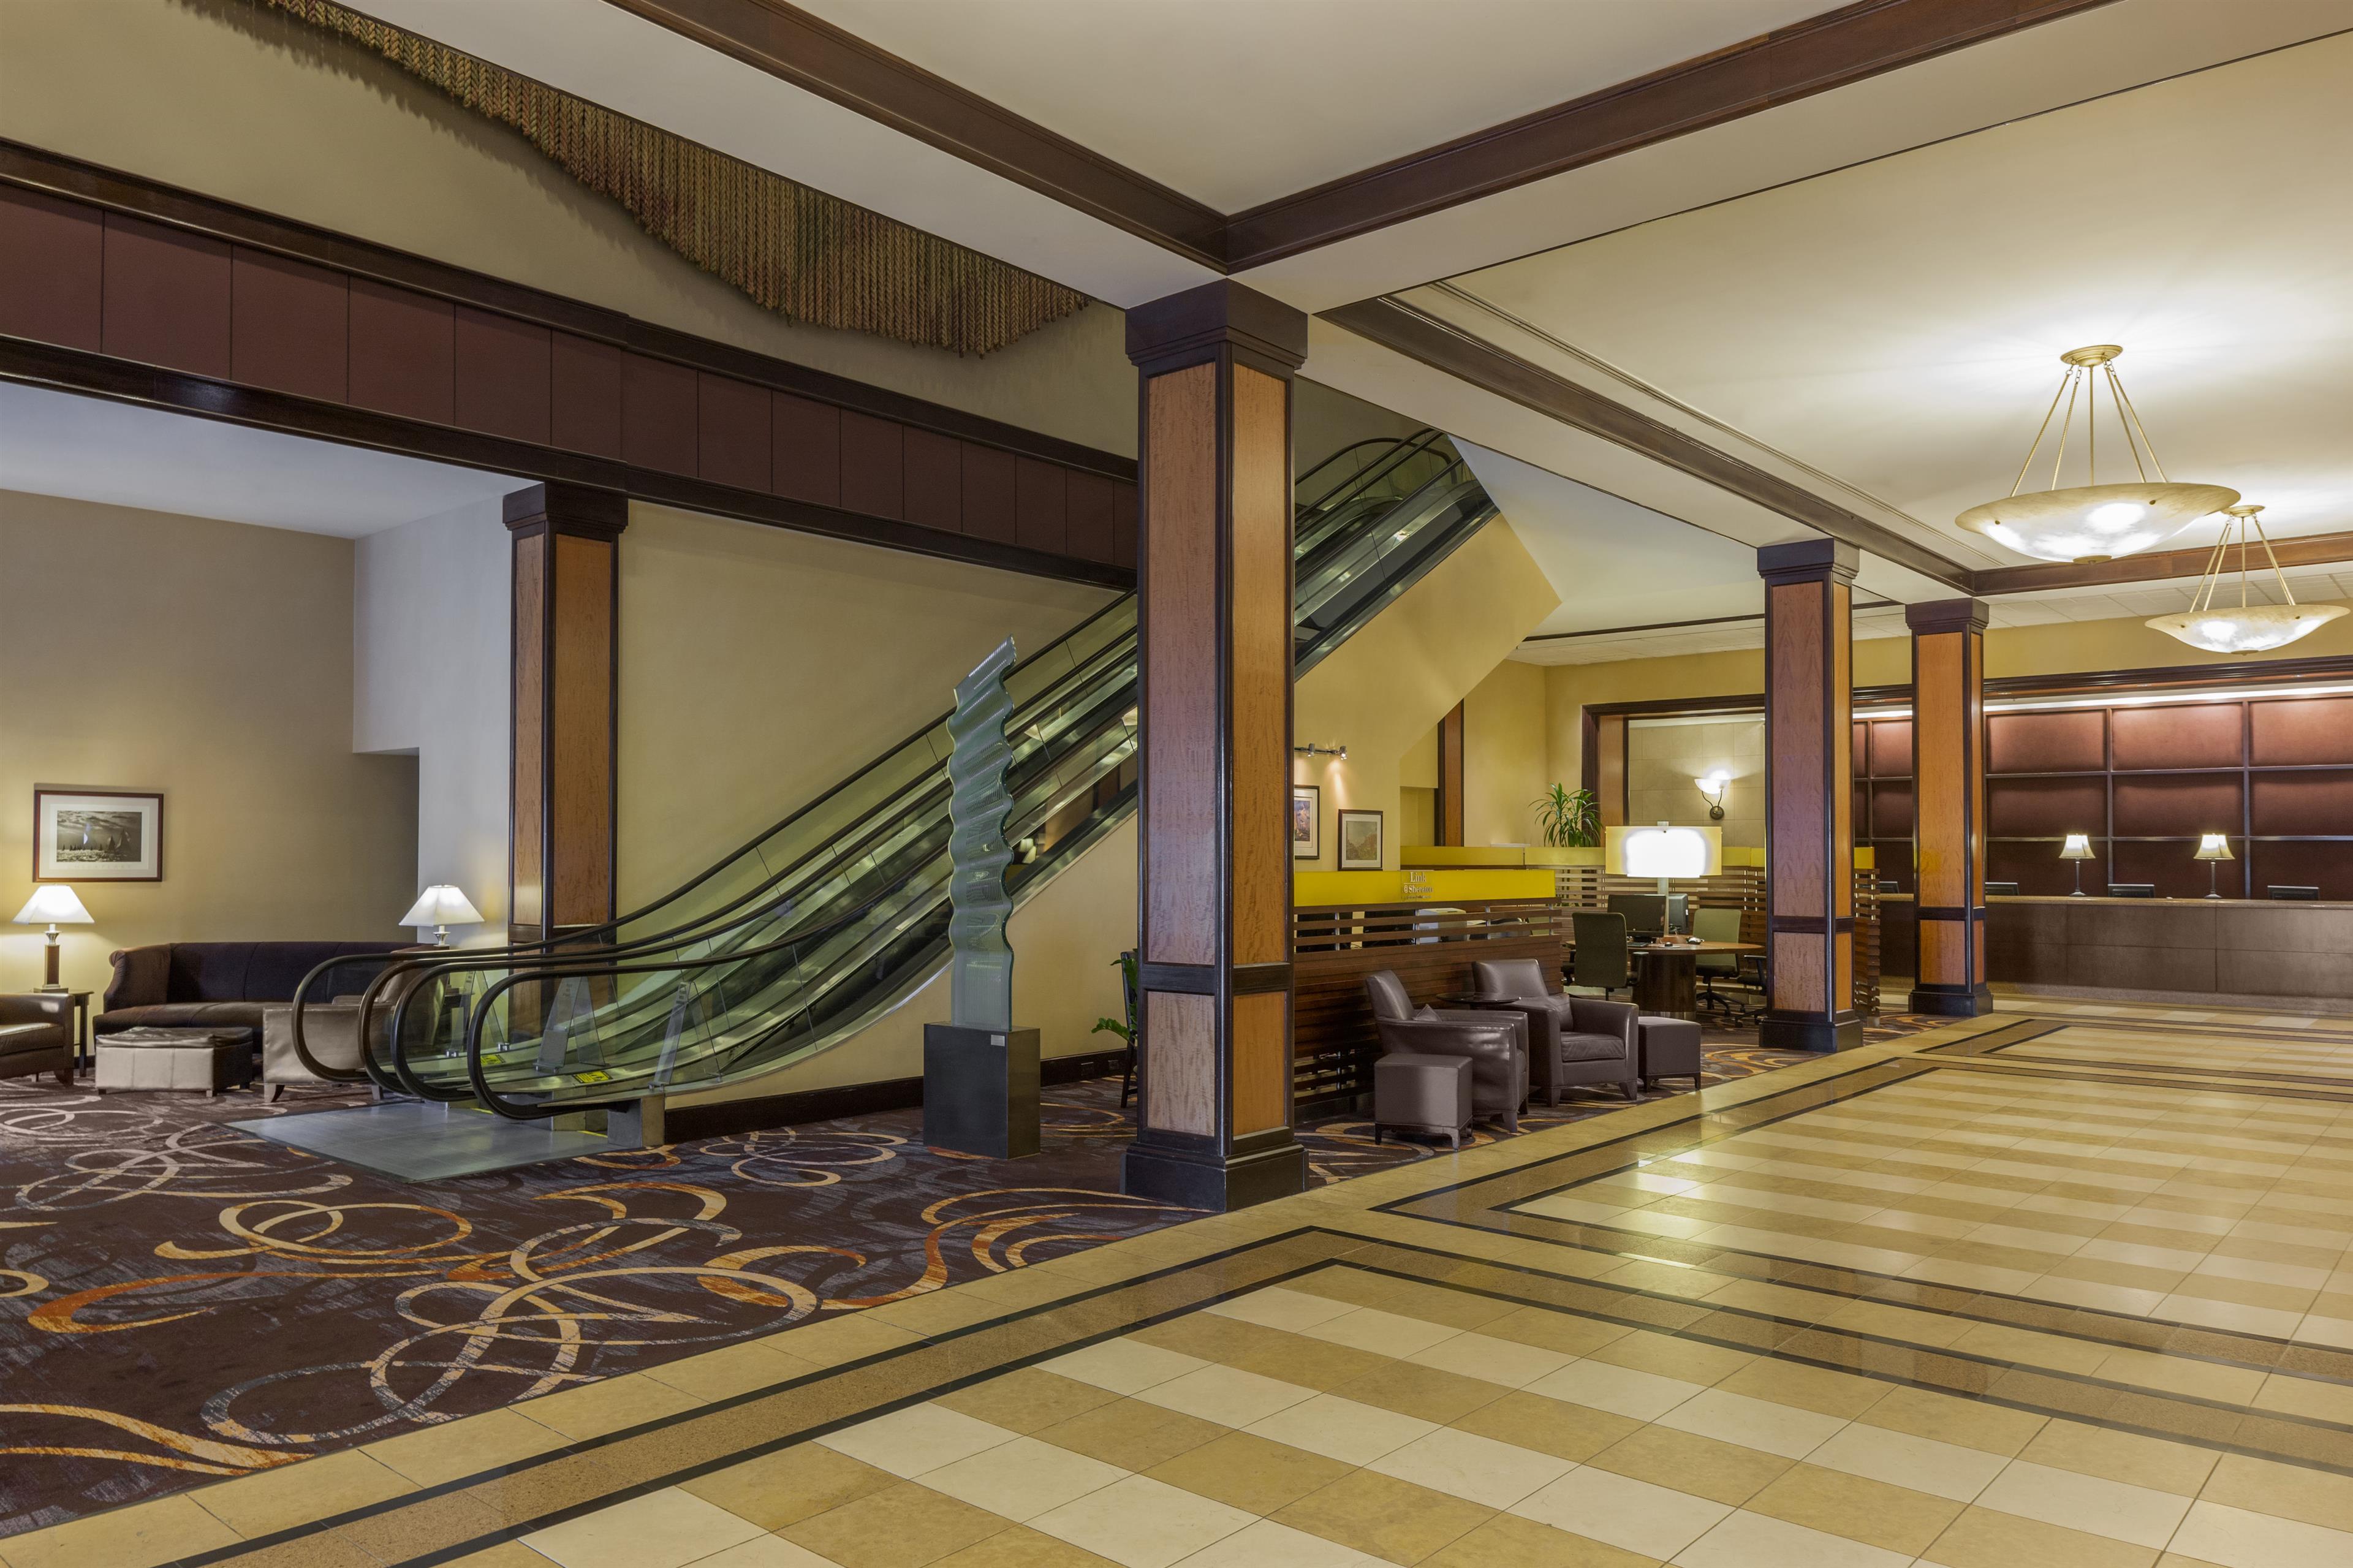 Sheraton Inner Harbor Hotel image 1